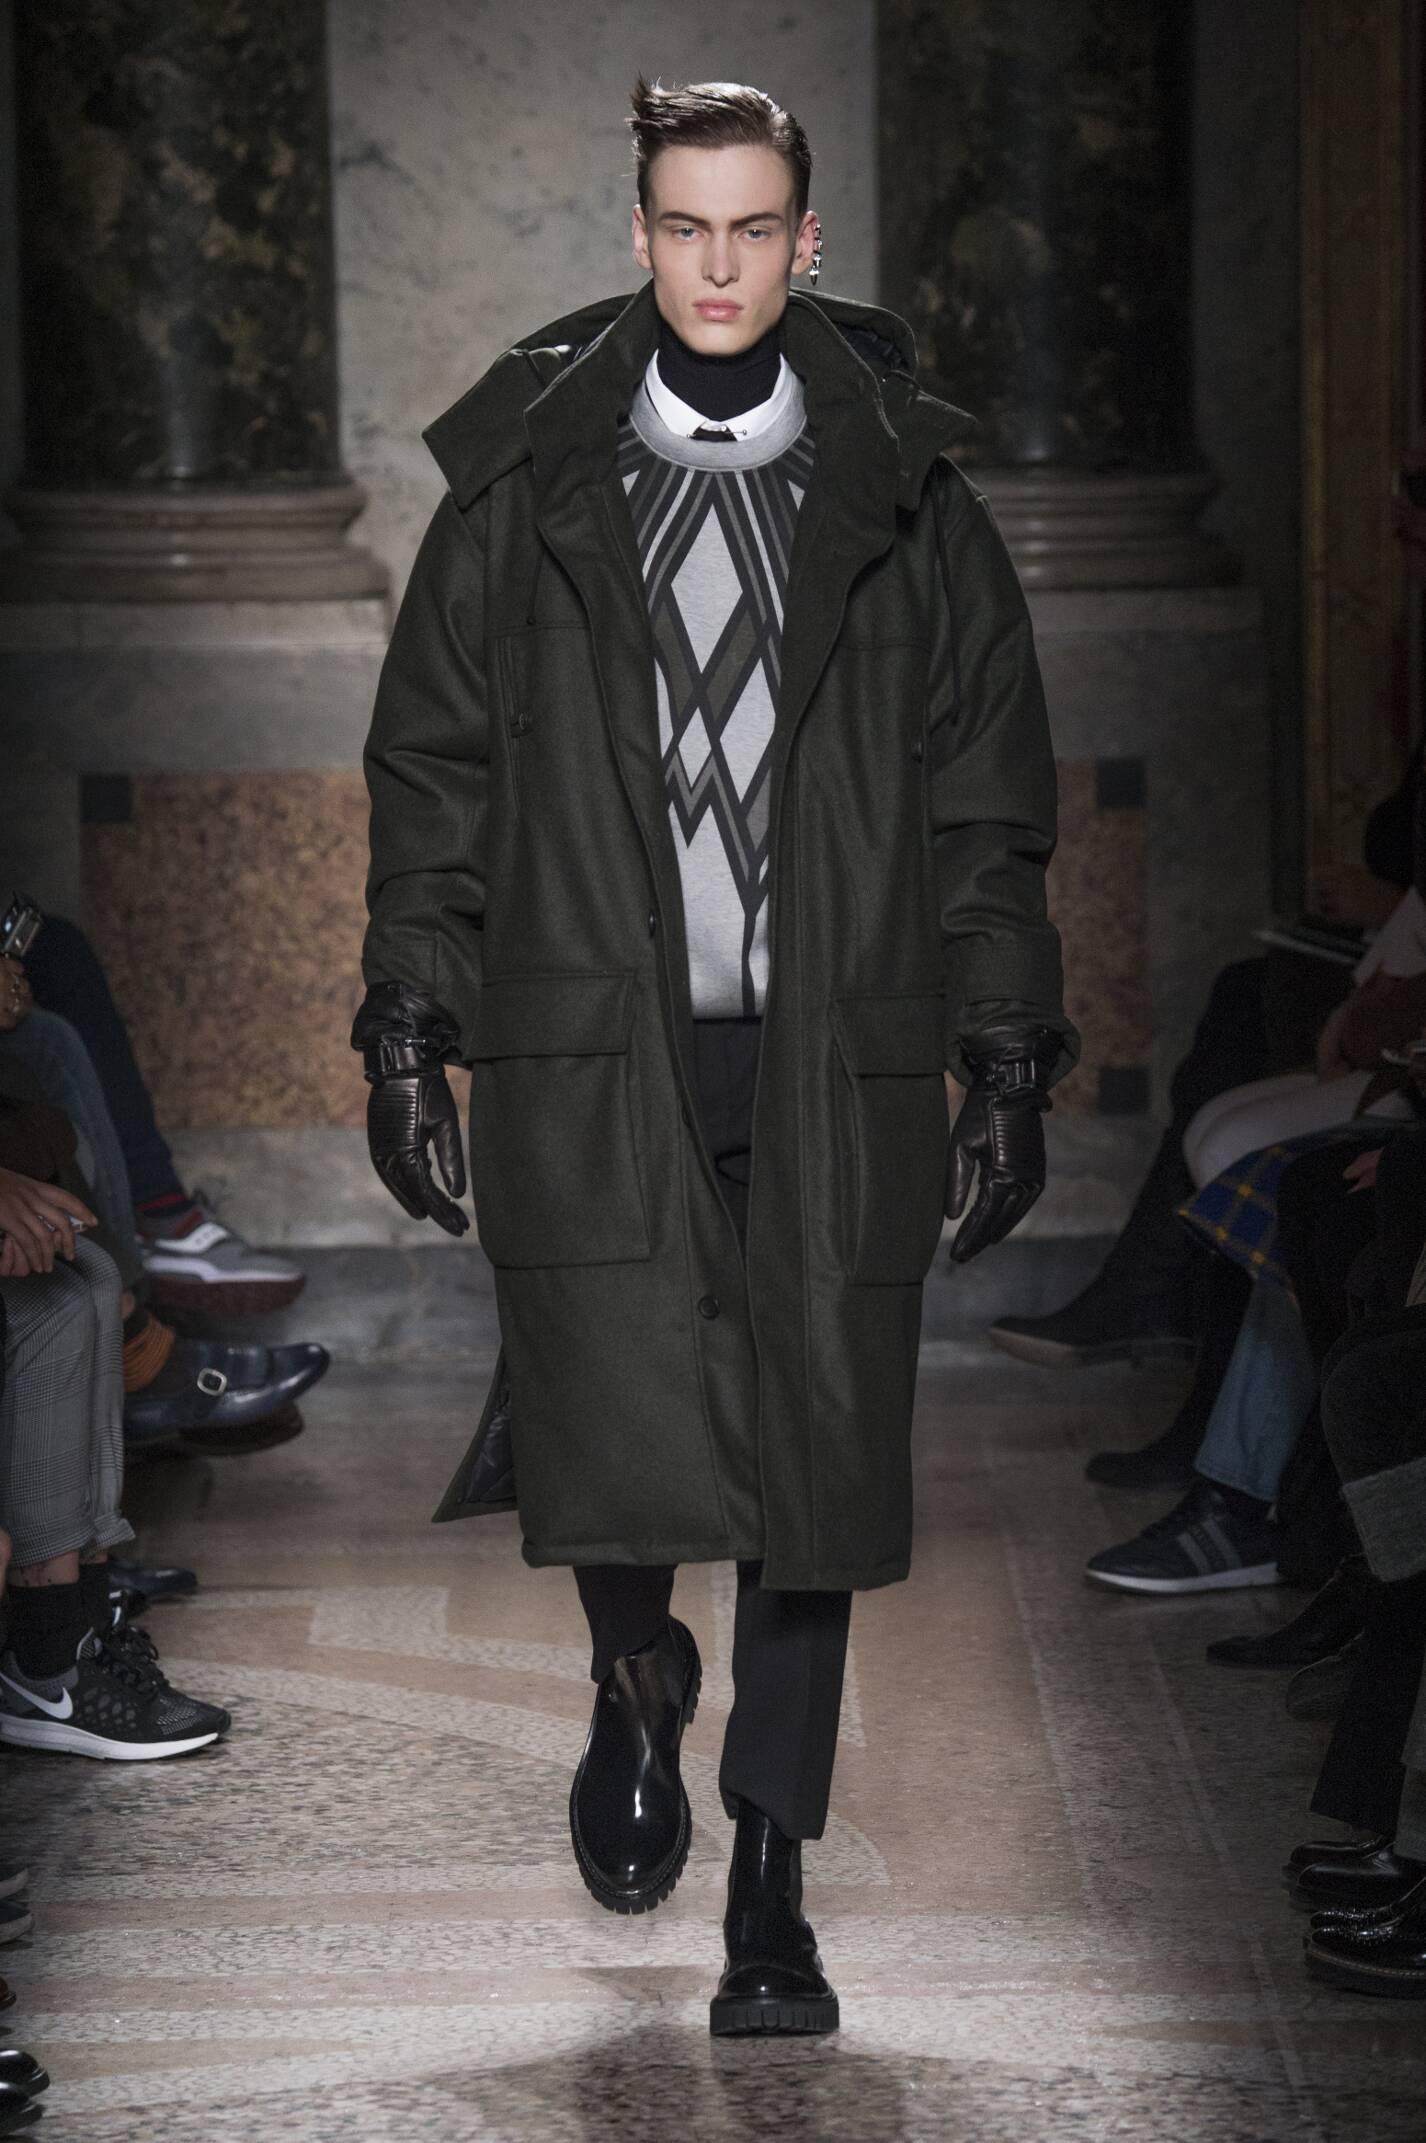 Winter Fashion Trends 2015 2016 Les Hommes